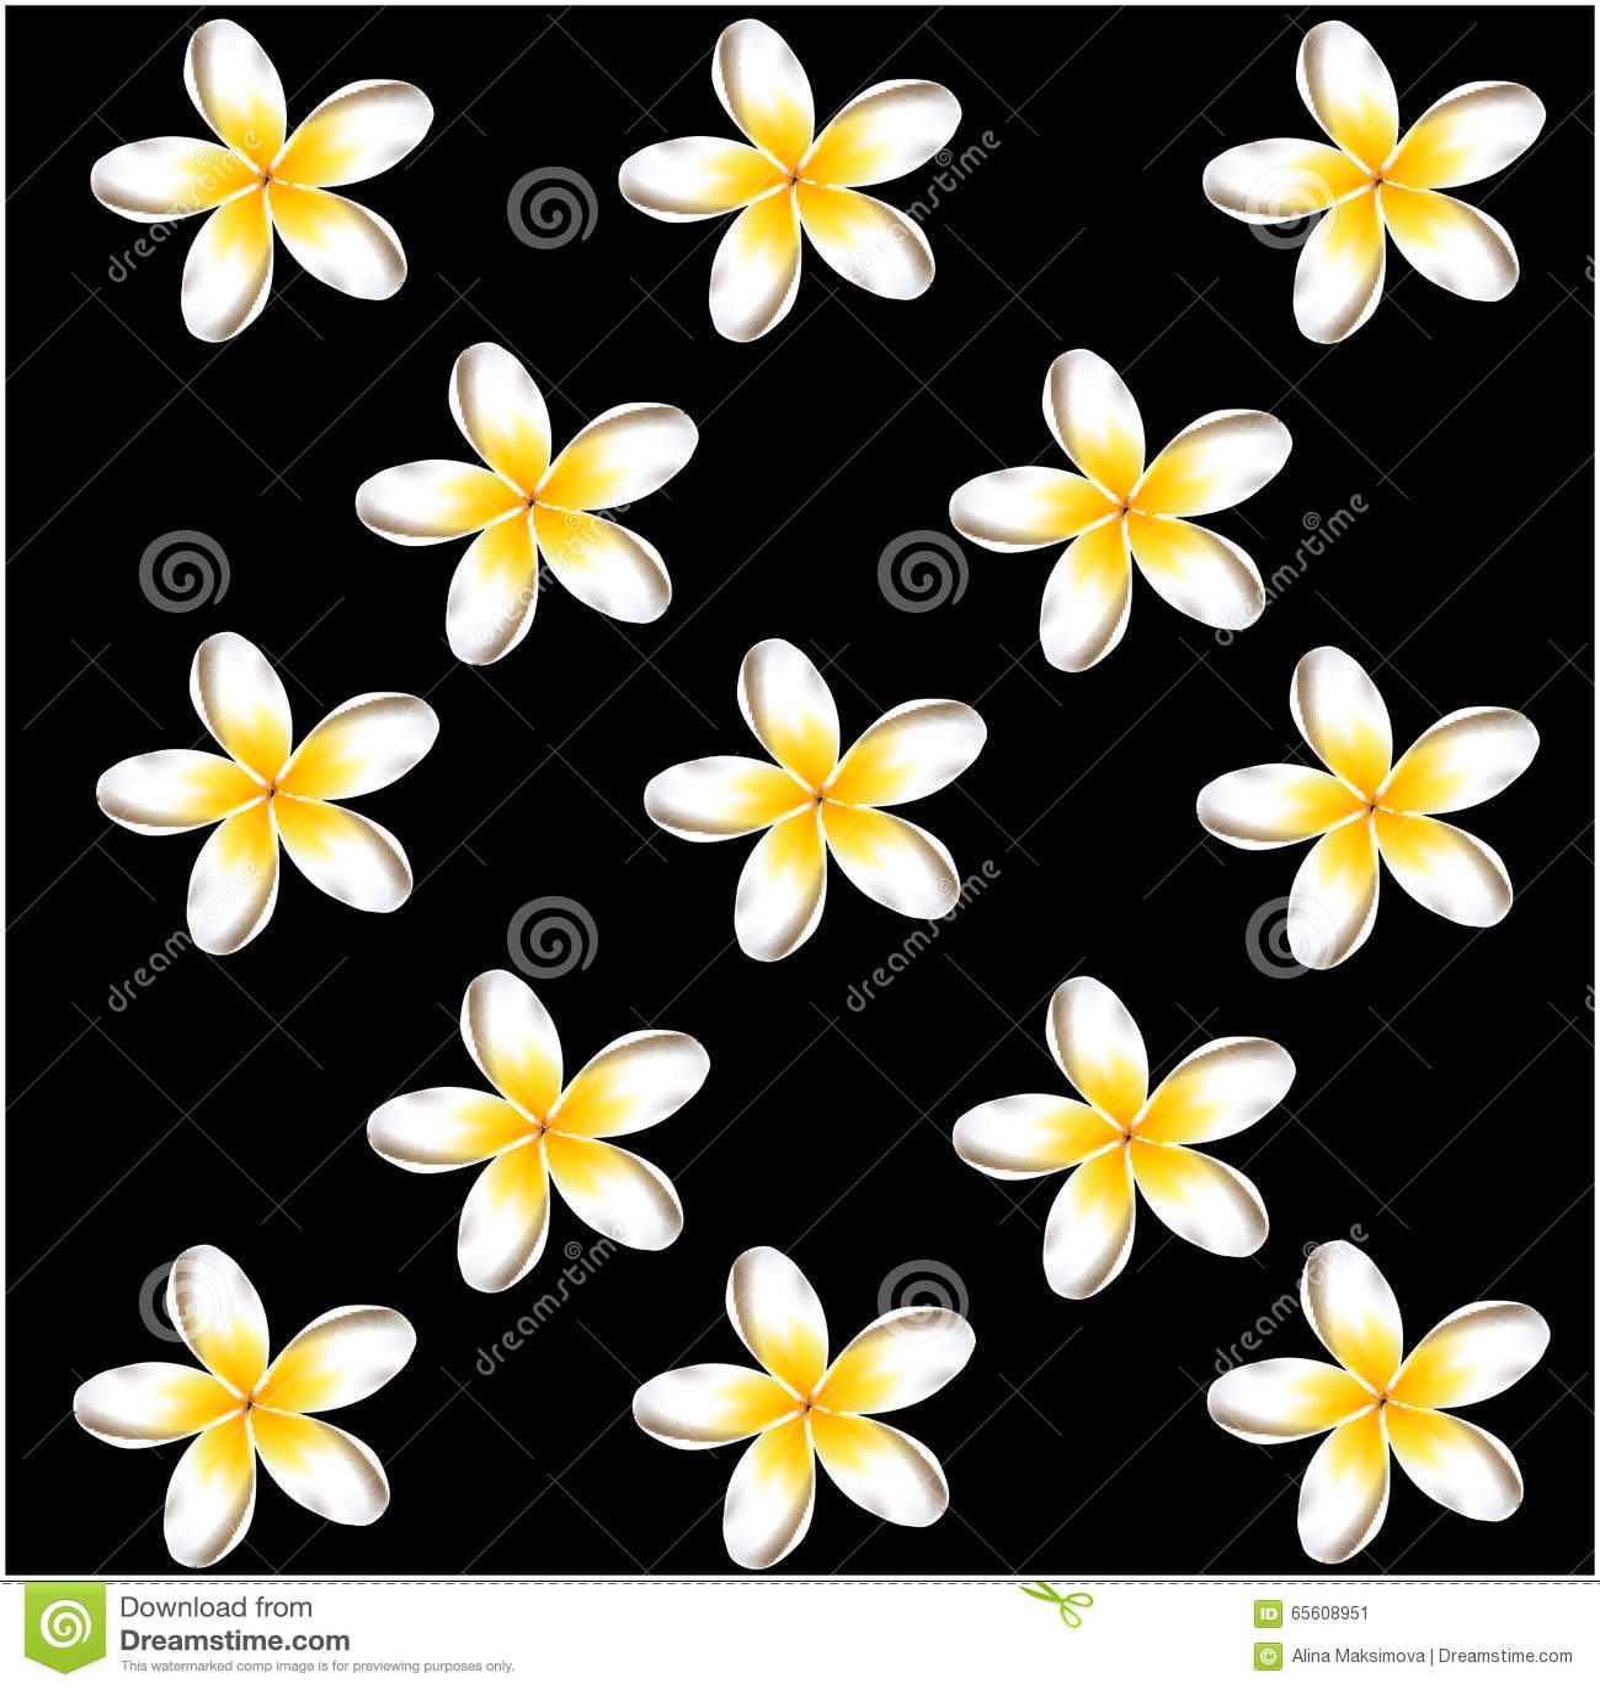 Plumeria Frangipani Flowers Black Background Stock Vector ... Leelawadee